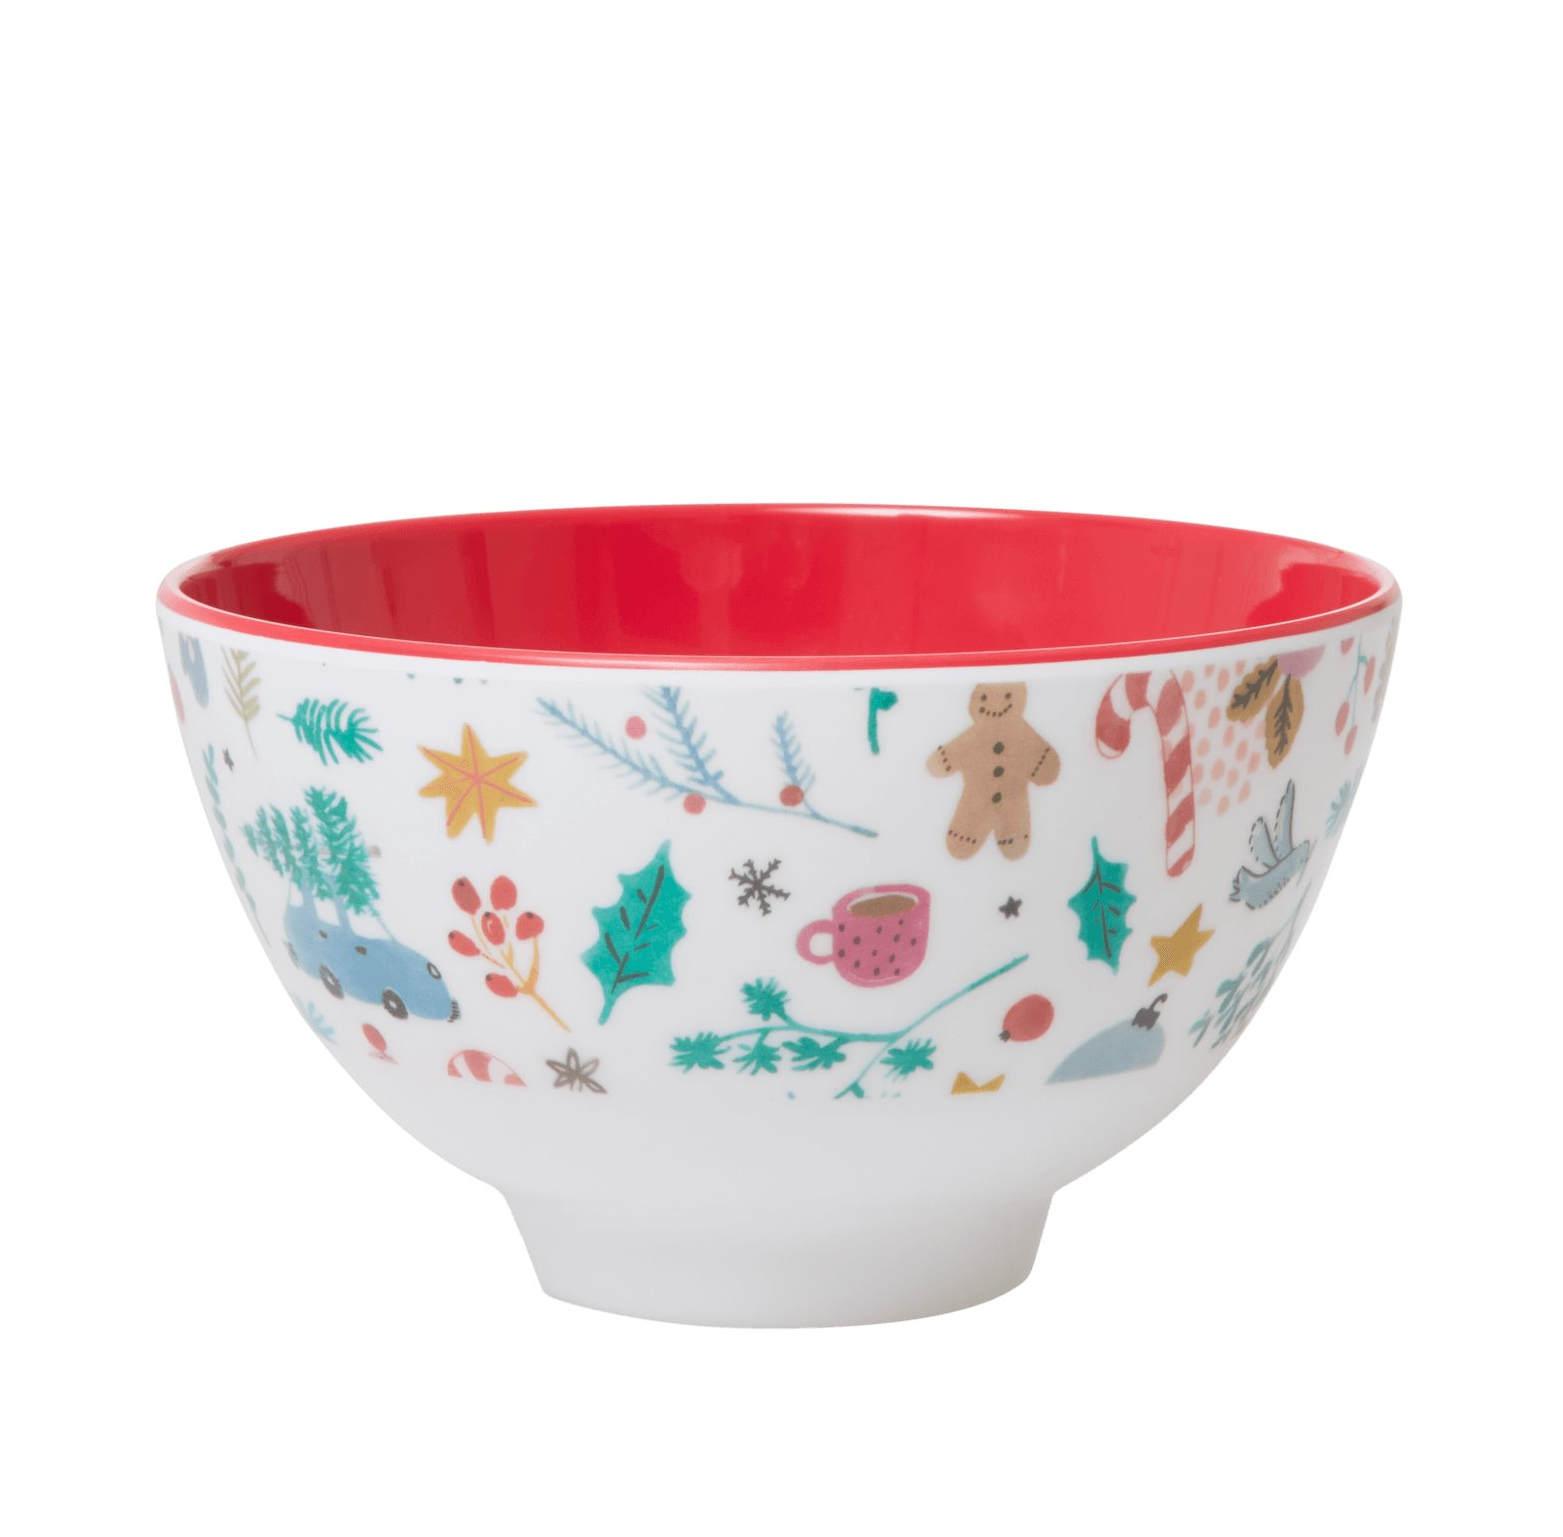 rice Melaminová vánoční miska All Over Xmas, červená barva, krémová barva, melamin